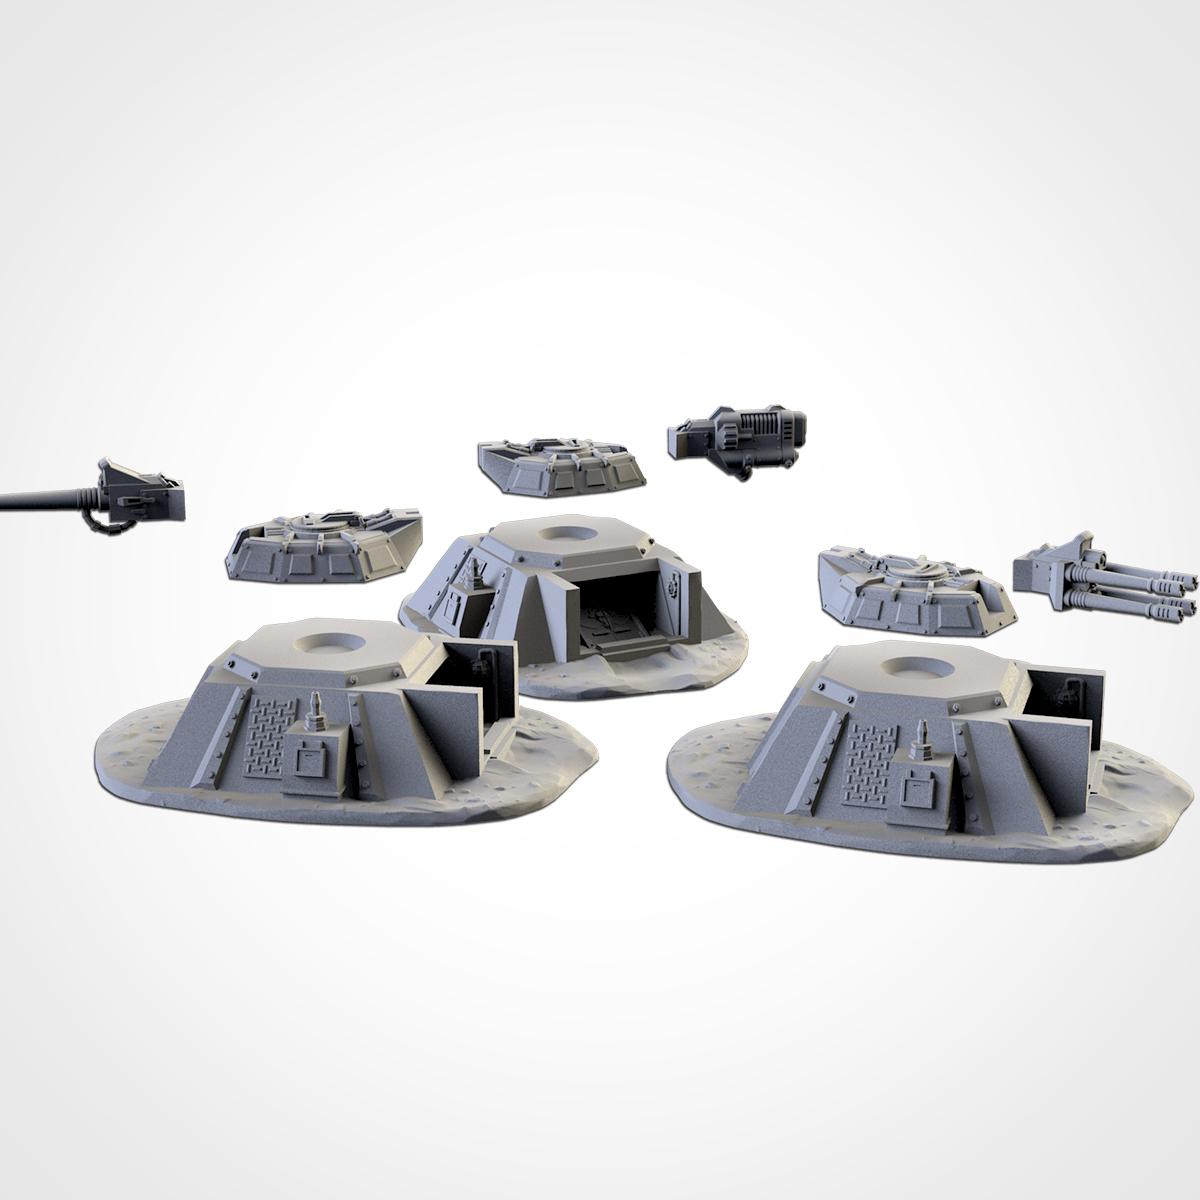 TXFA_WEB_BUNKERS_03.jpg Download STL file ARMED BUNKERS • 3D printer template, Txarli_Factory